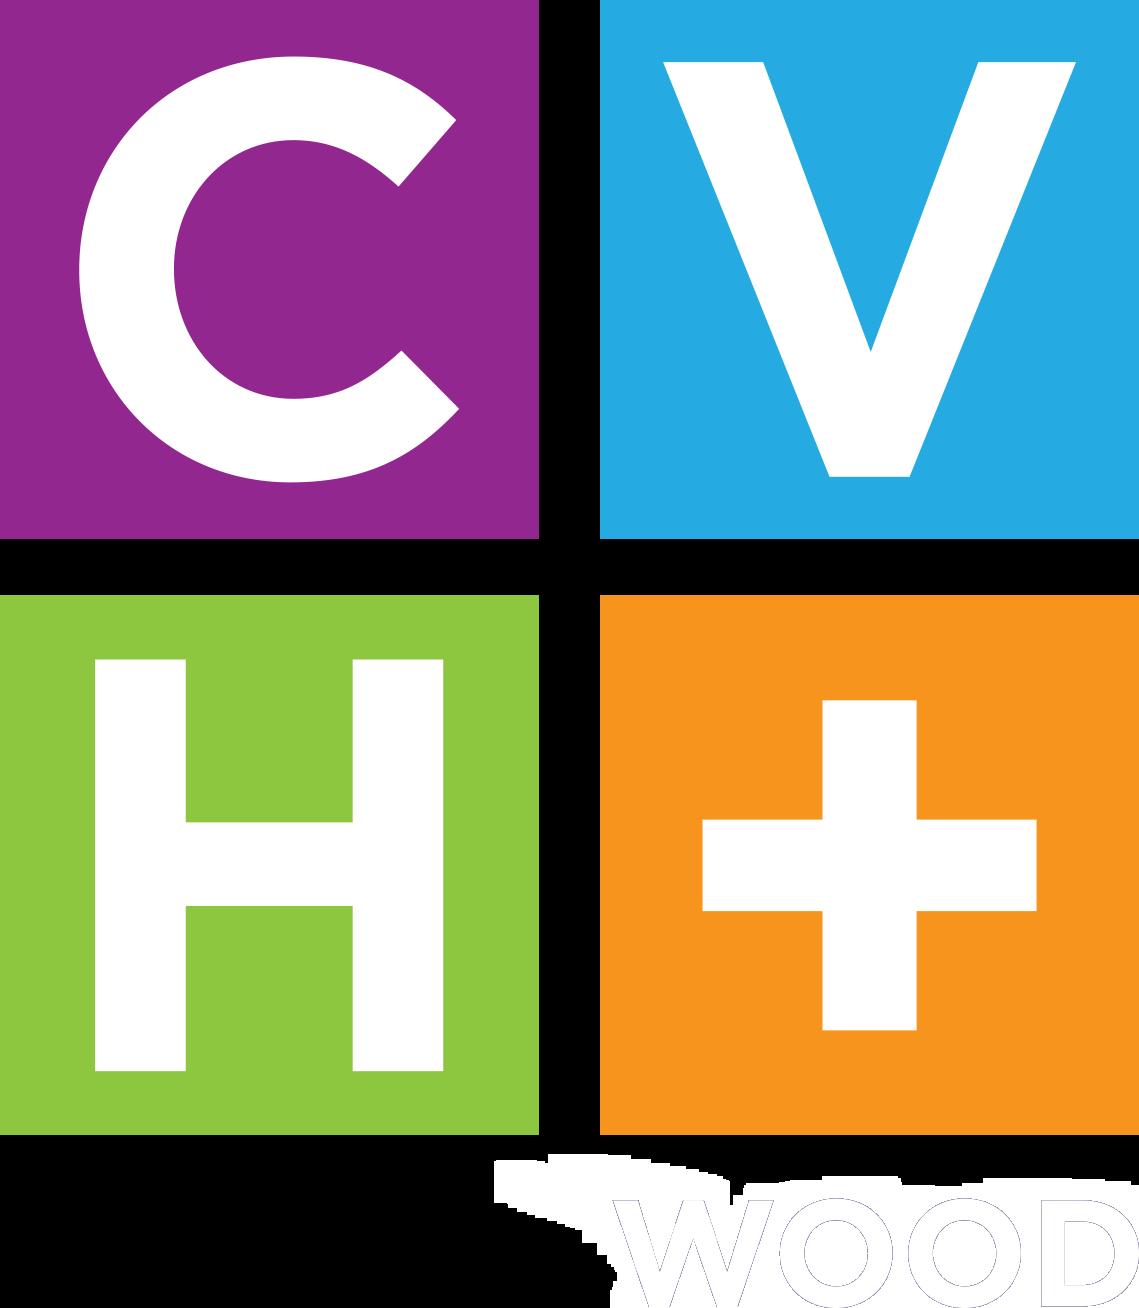 Cvh Wood